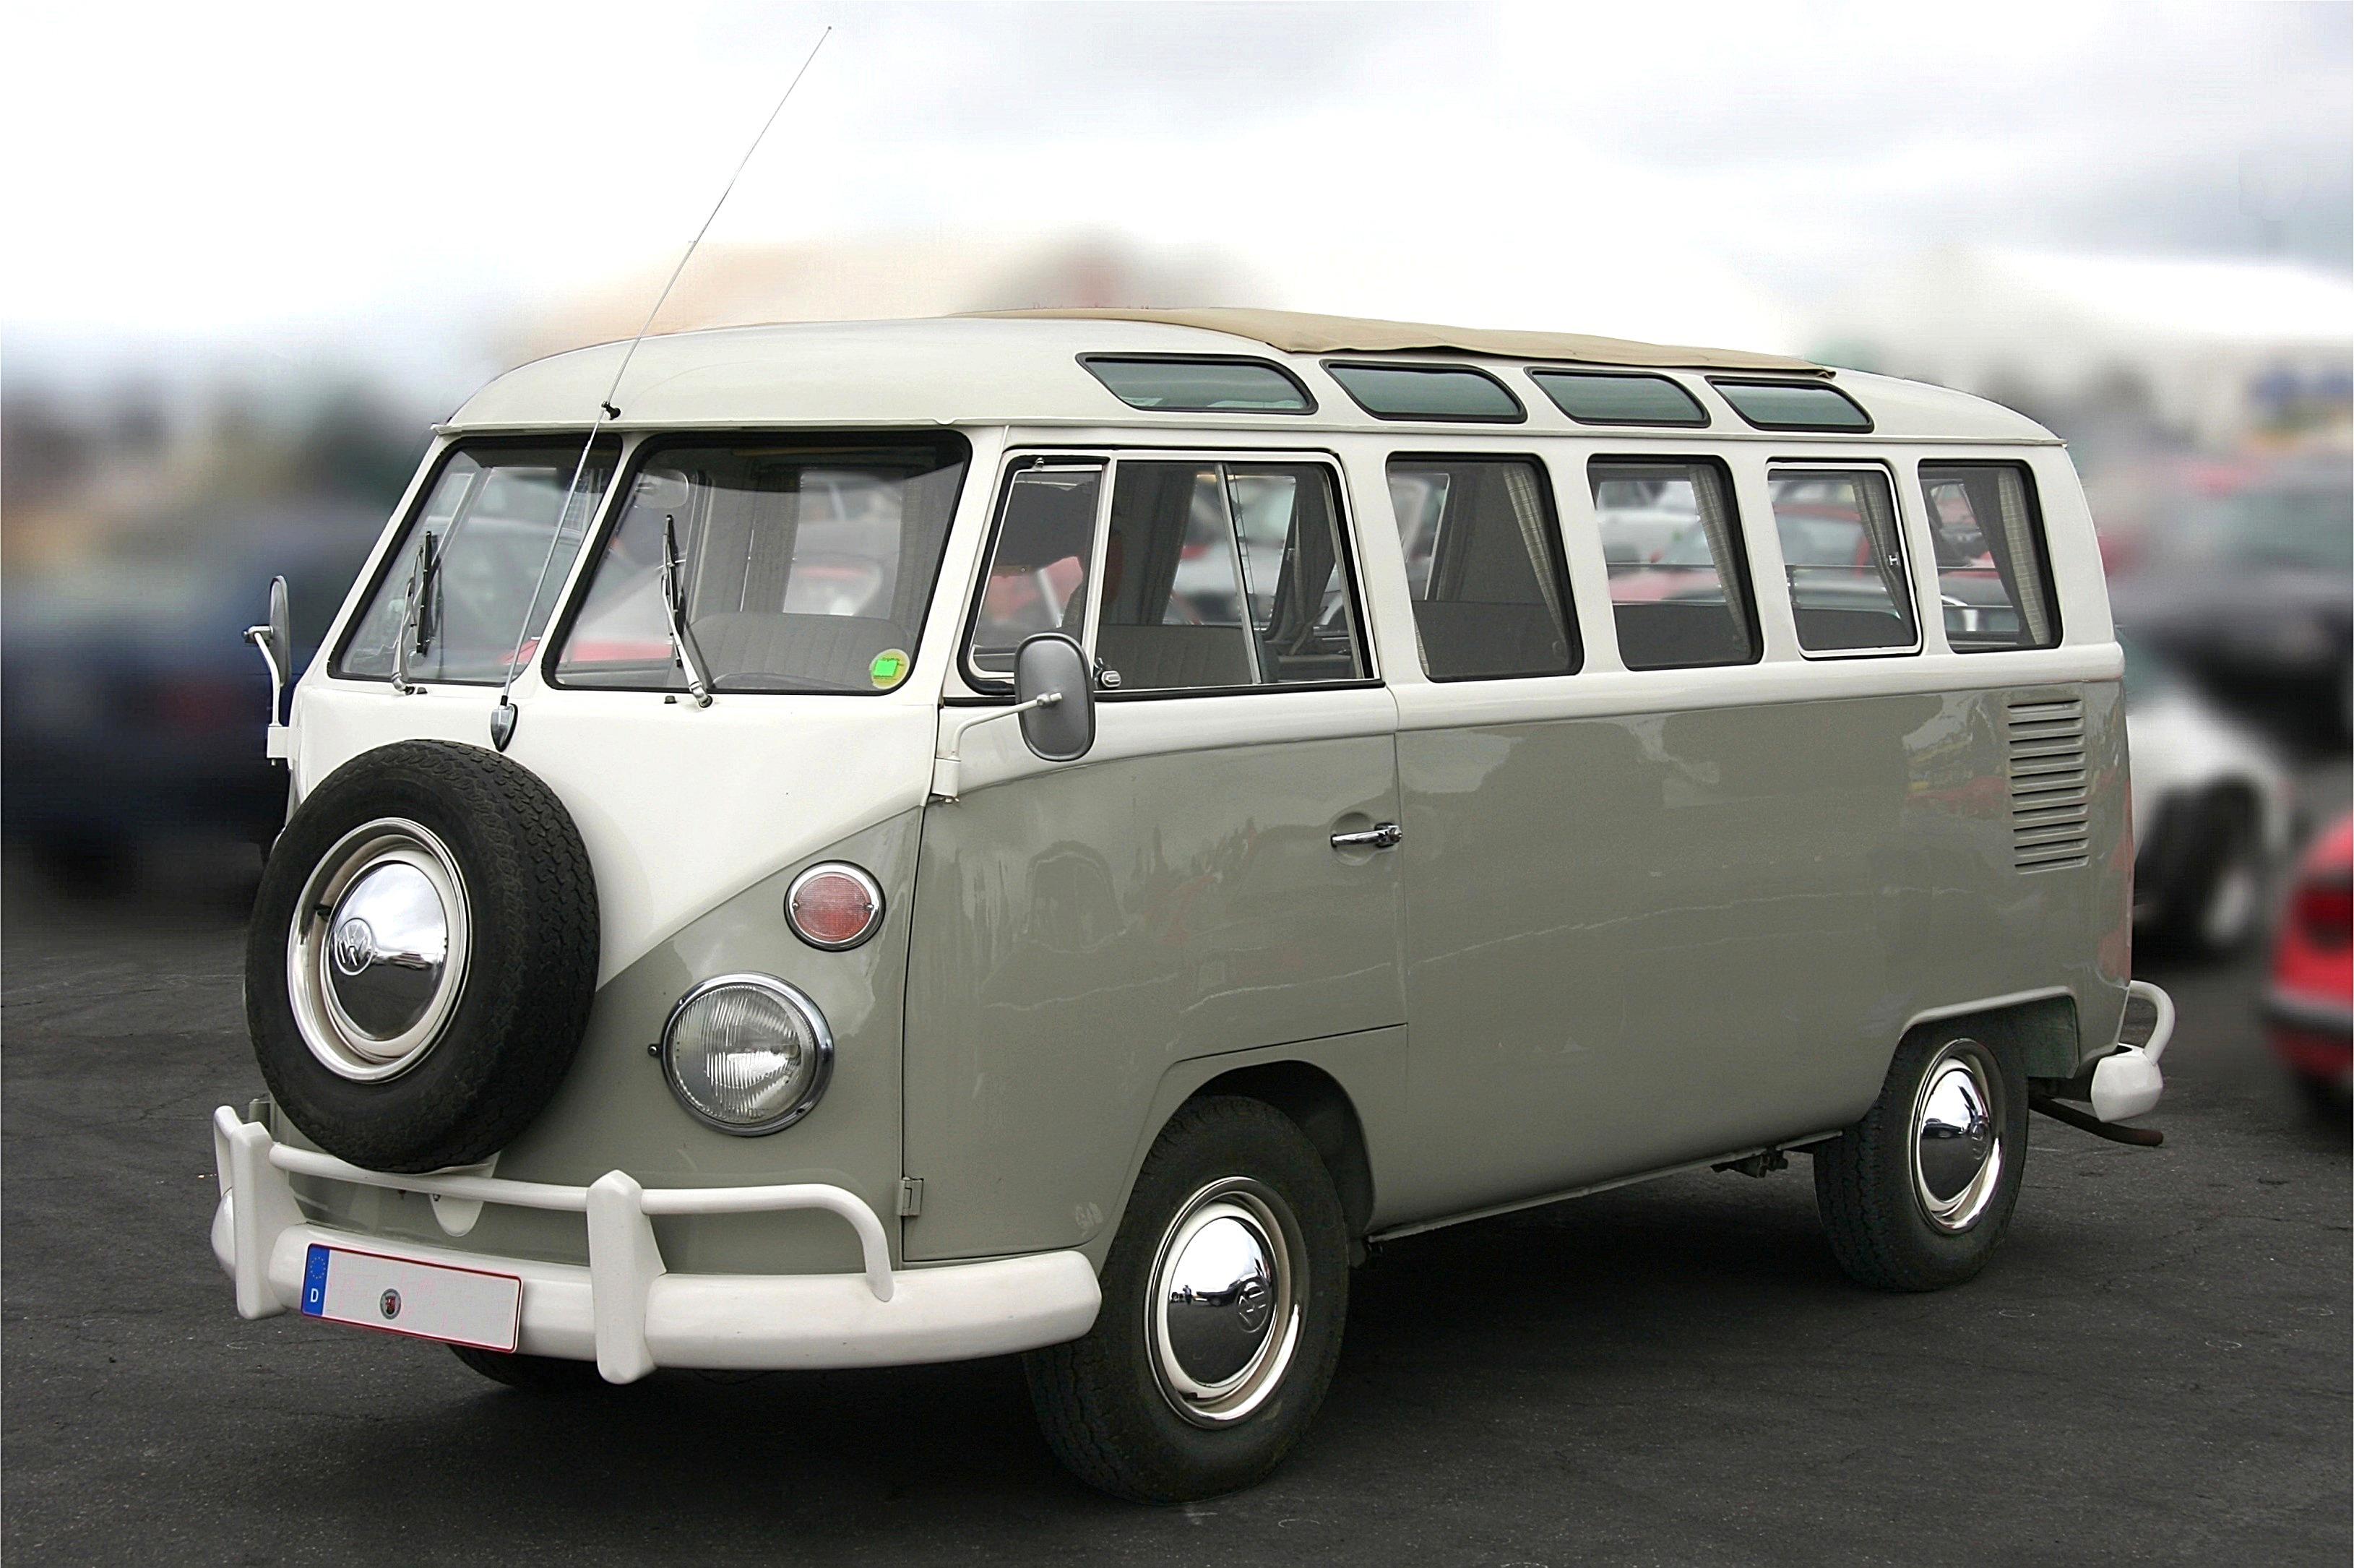 file vw bus t1 modell 1965 2008 06 28 ret jpg wikimedia commons. Black Bedroom Furniture Sets. Home Design Ideas